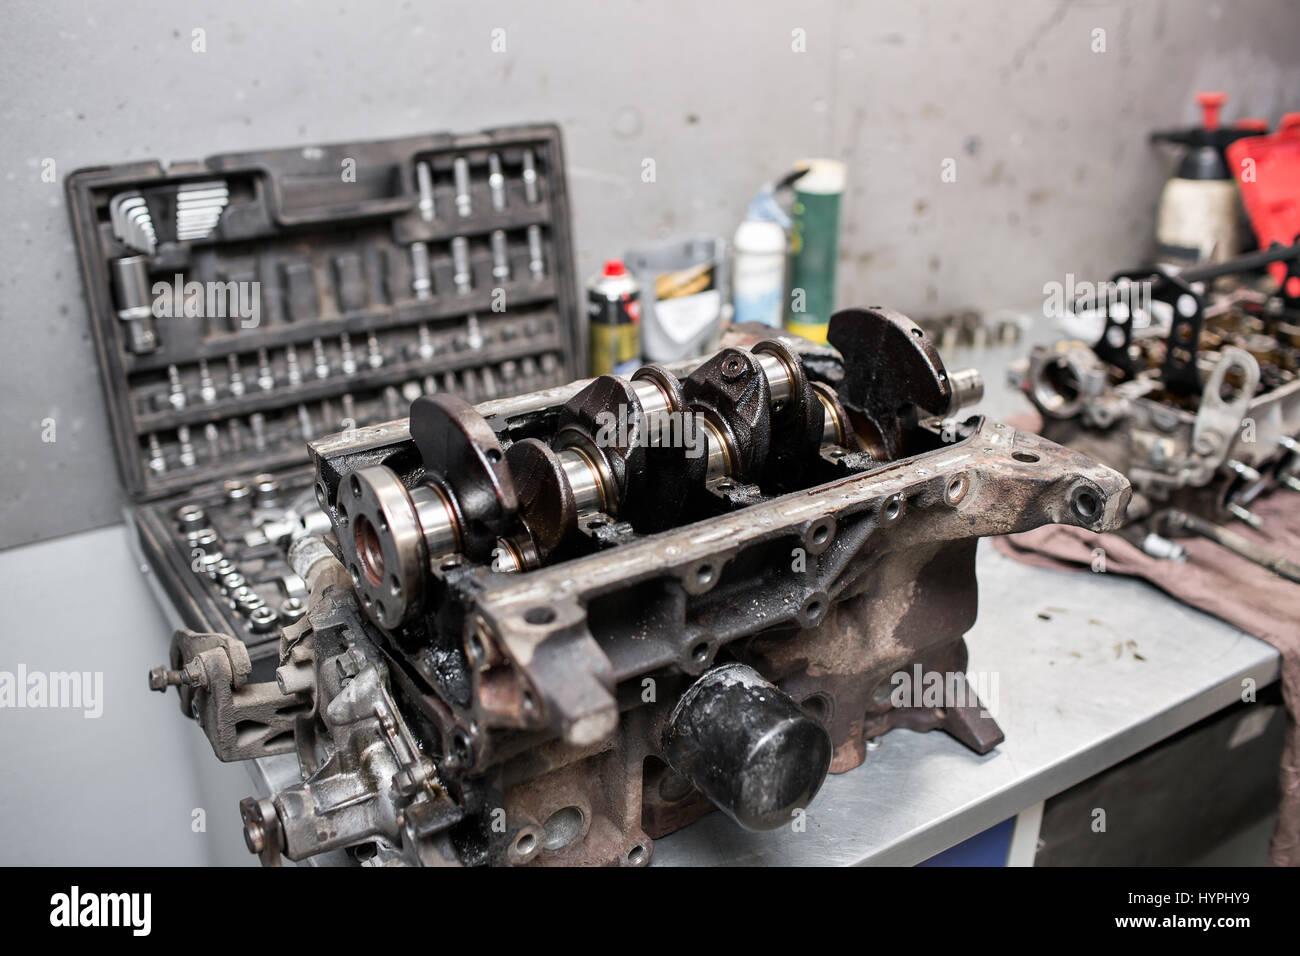 Engine crankshaft, valve cover, pistons. mechanic repairman at automobile car engine maintenance repair work - Stock Image